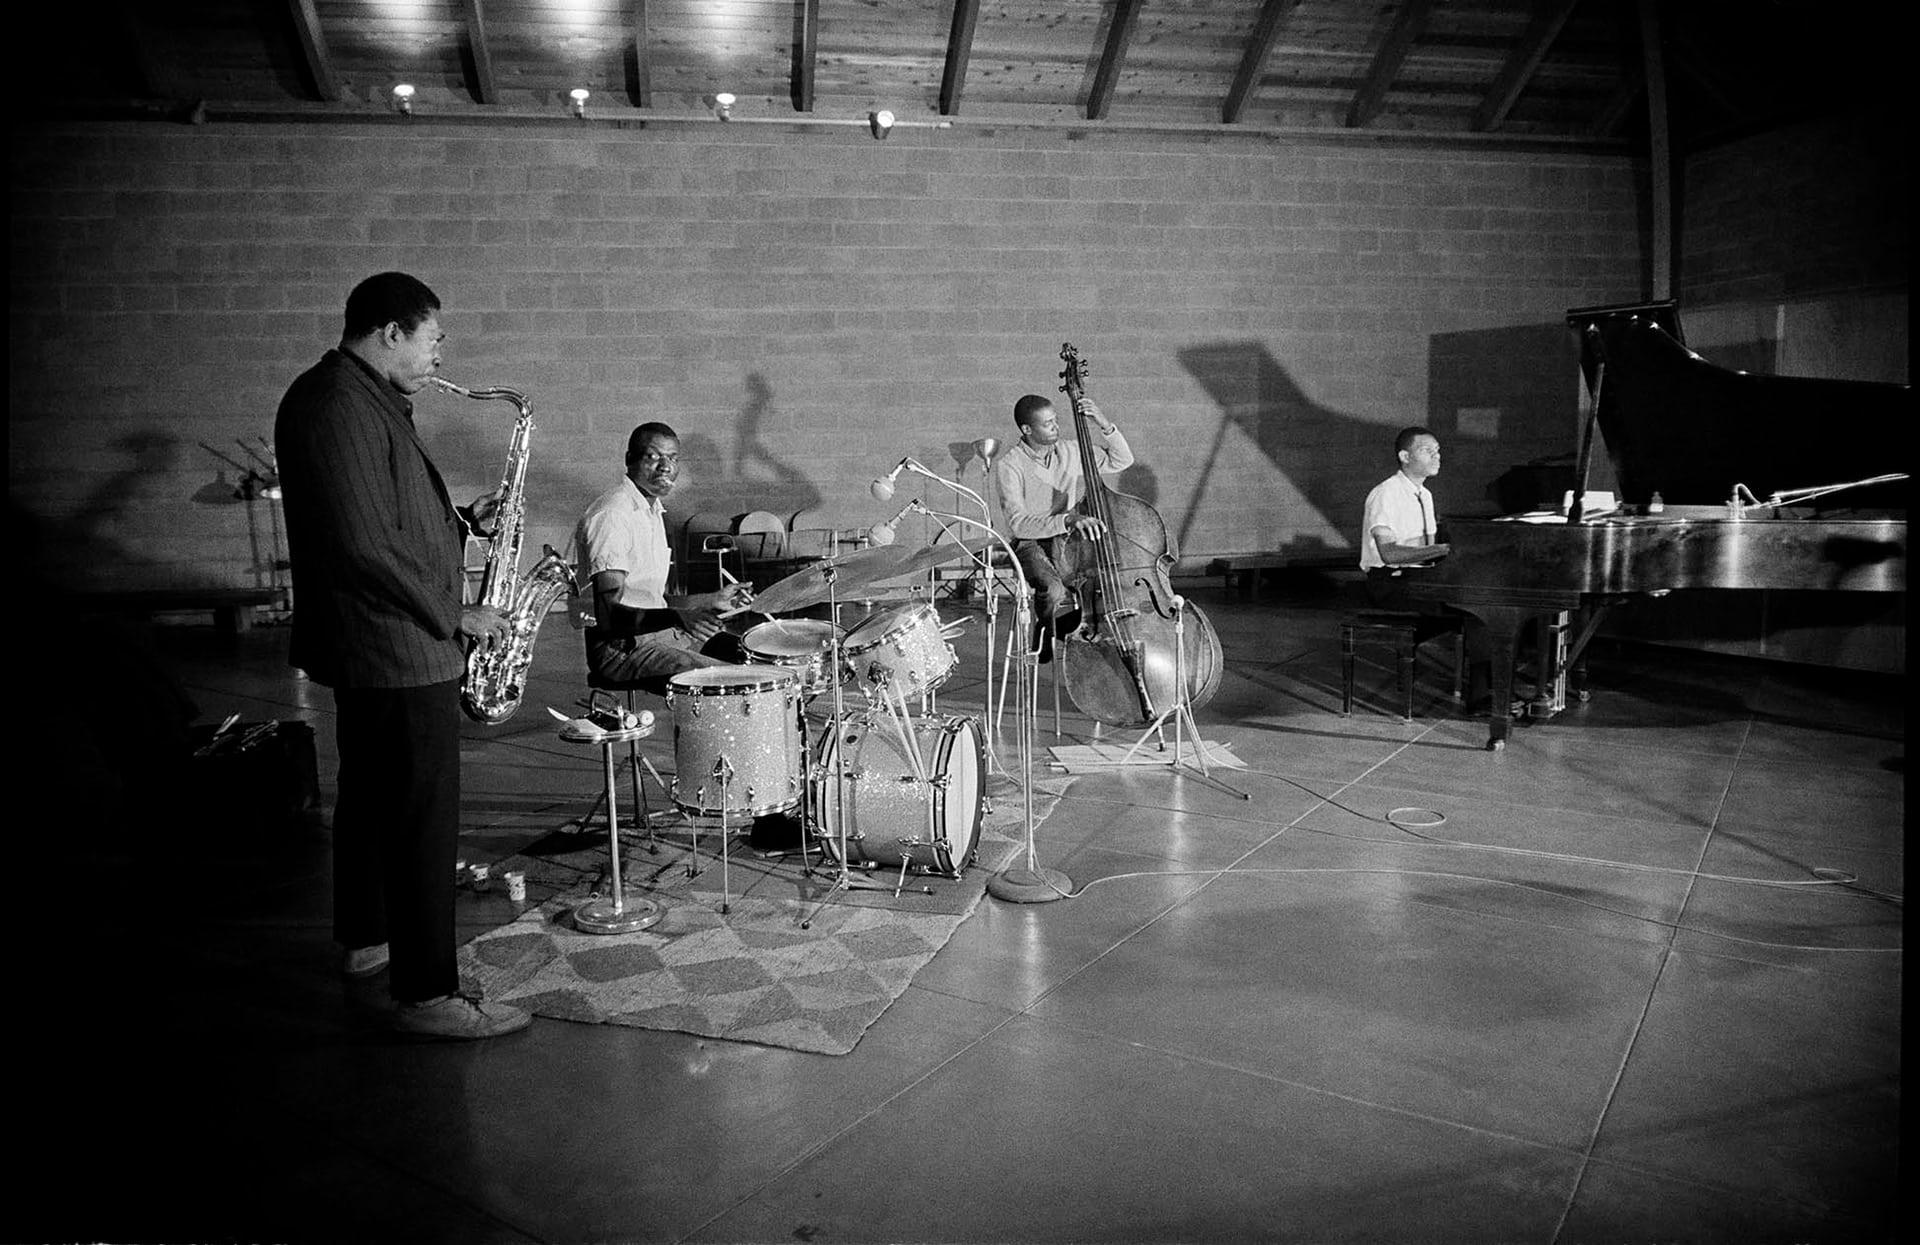 John Coltrane, A Love Supreme, Jimmy Garrison, Elvin Jones, McCoy Tyner, KOLUMN Magazine, KOLUMN, KINDR'D Magazine, KINDR'D